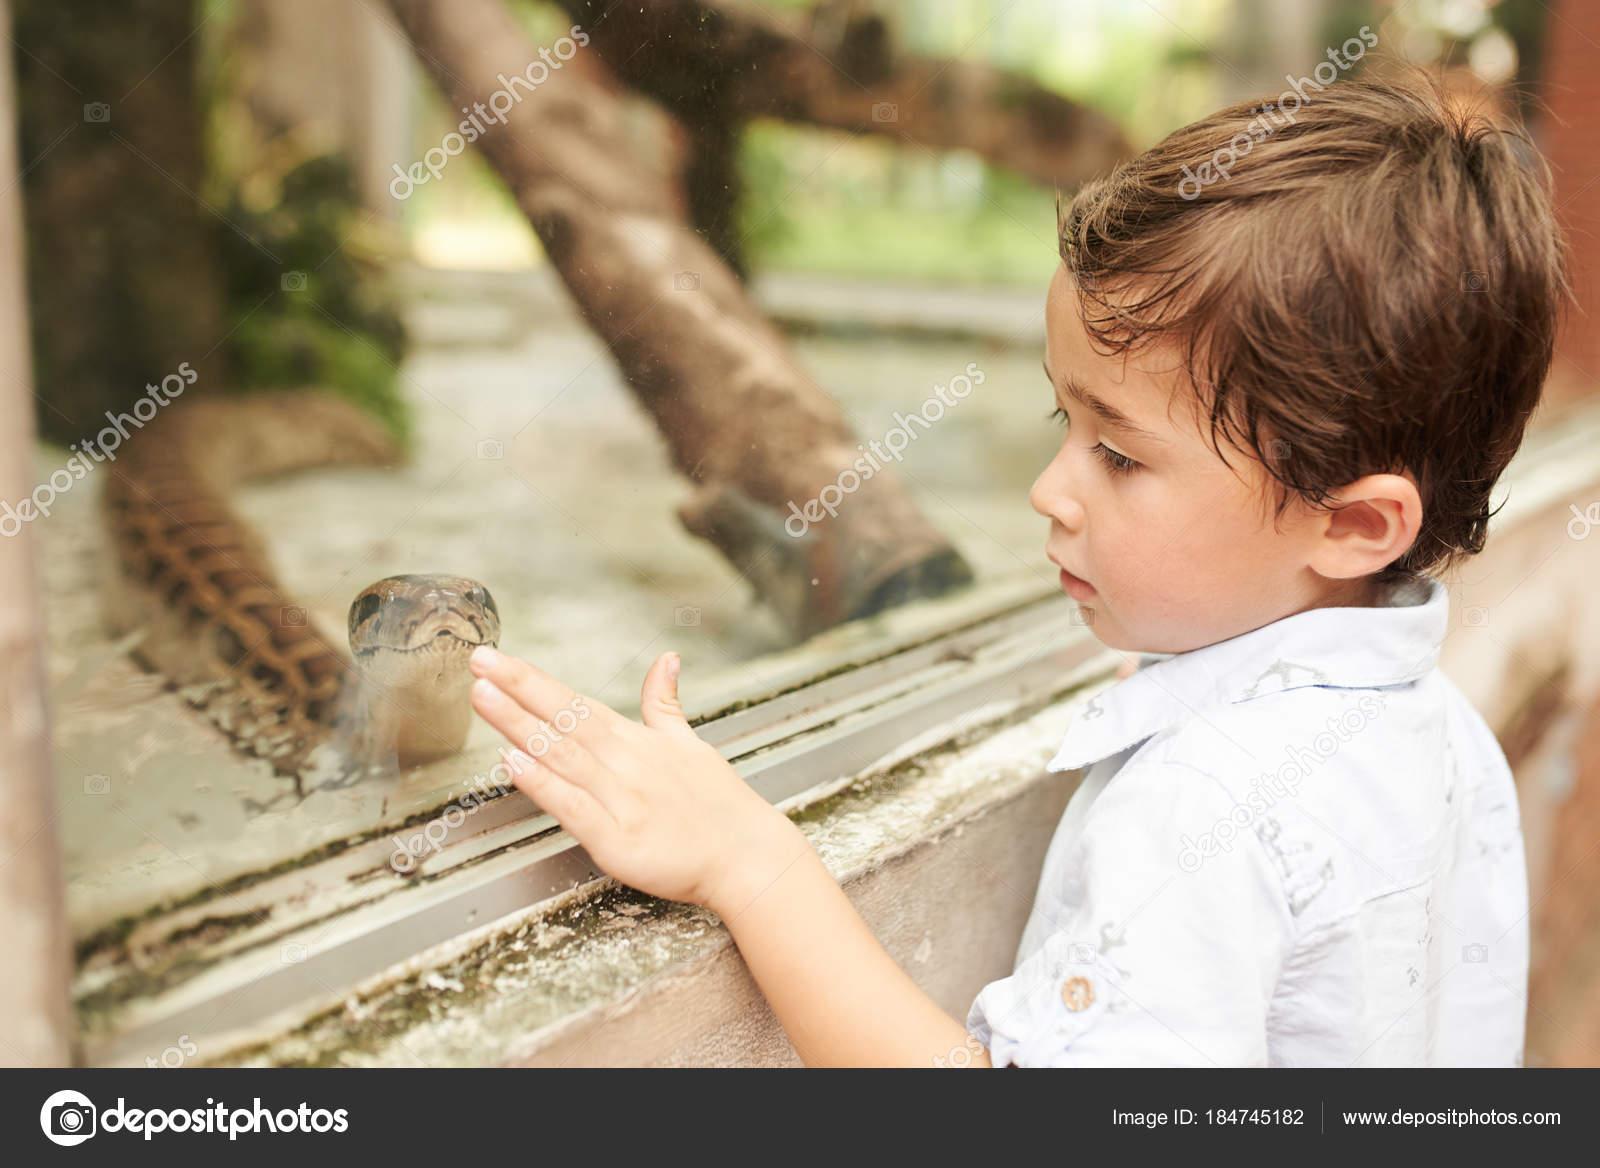 Little Boy Touching Glass Terrarium Big Snake Stock Photo